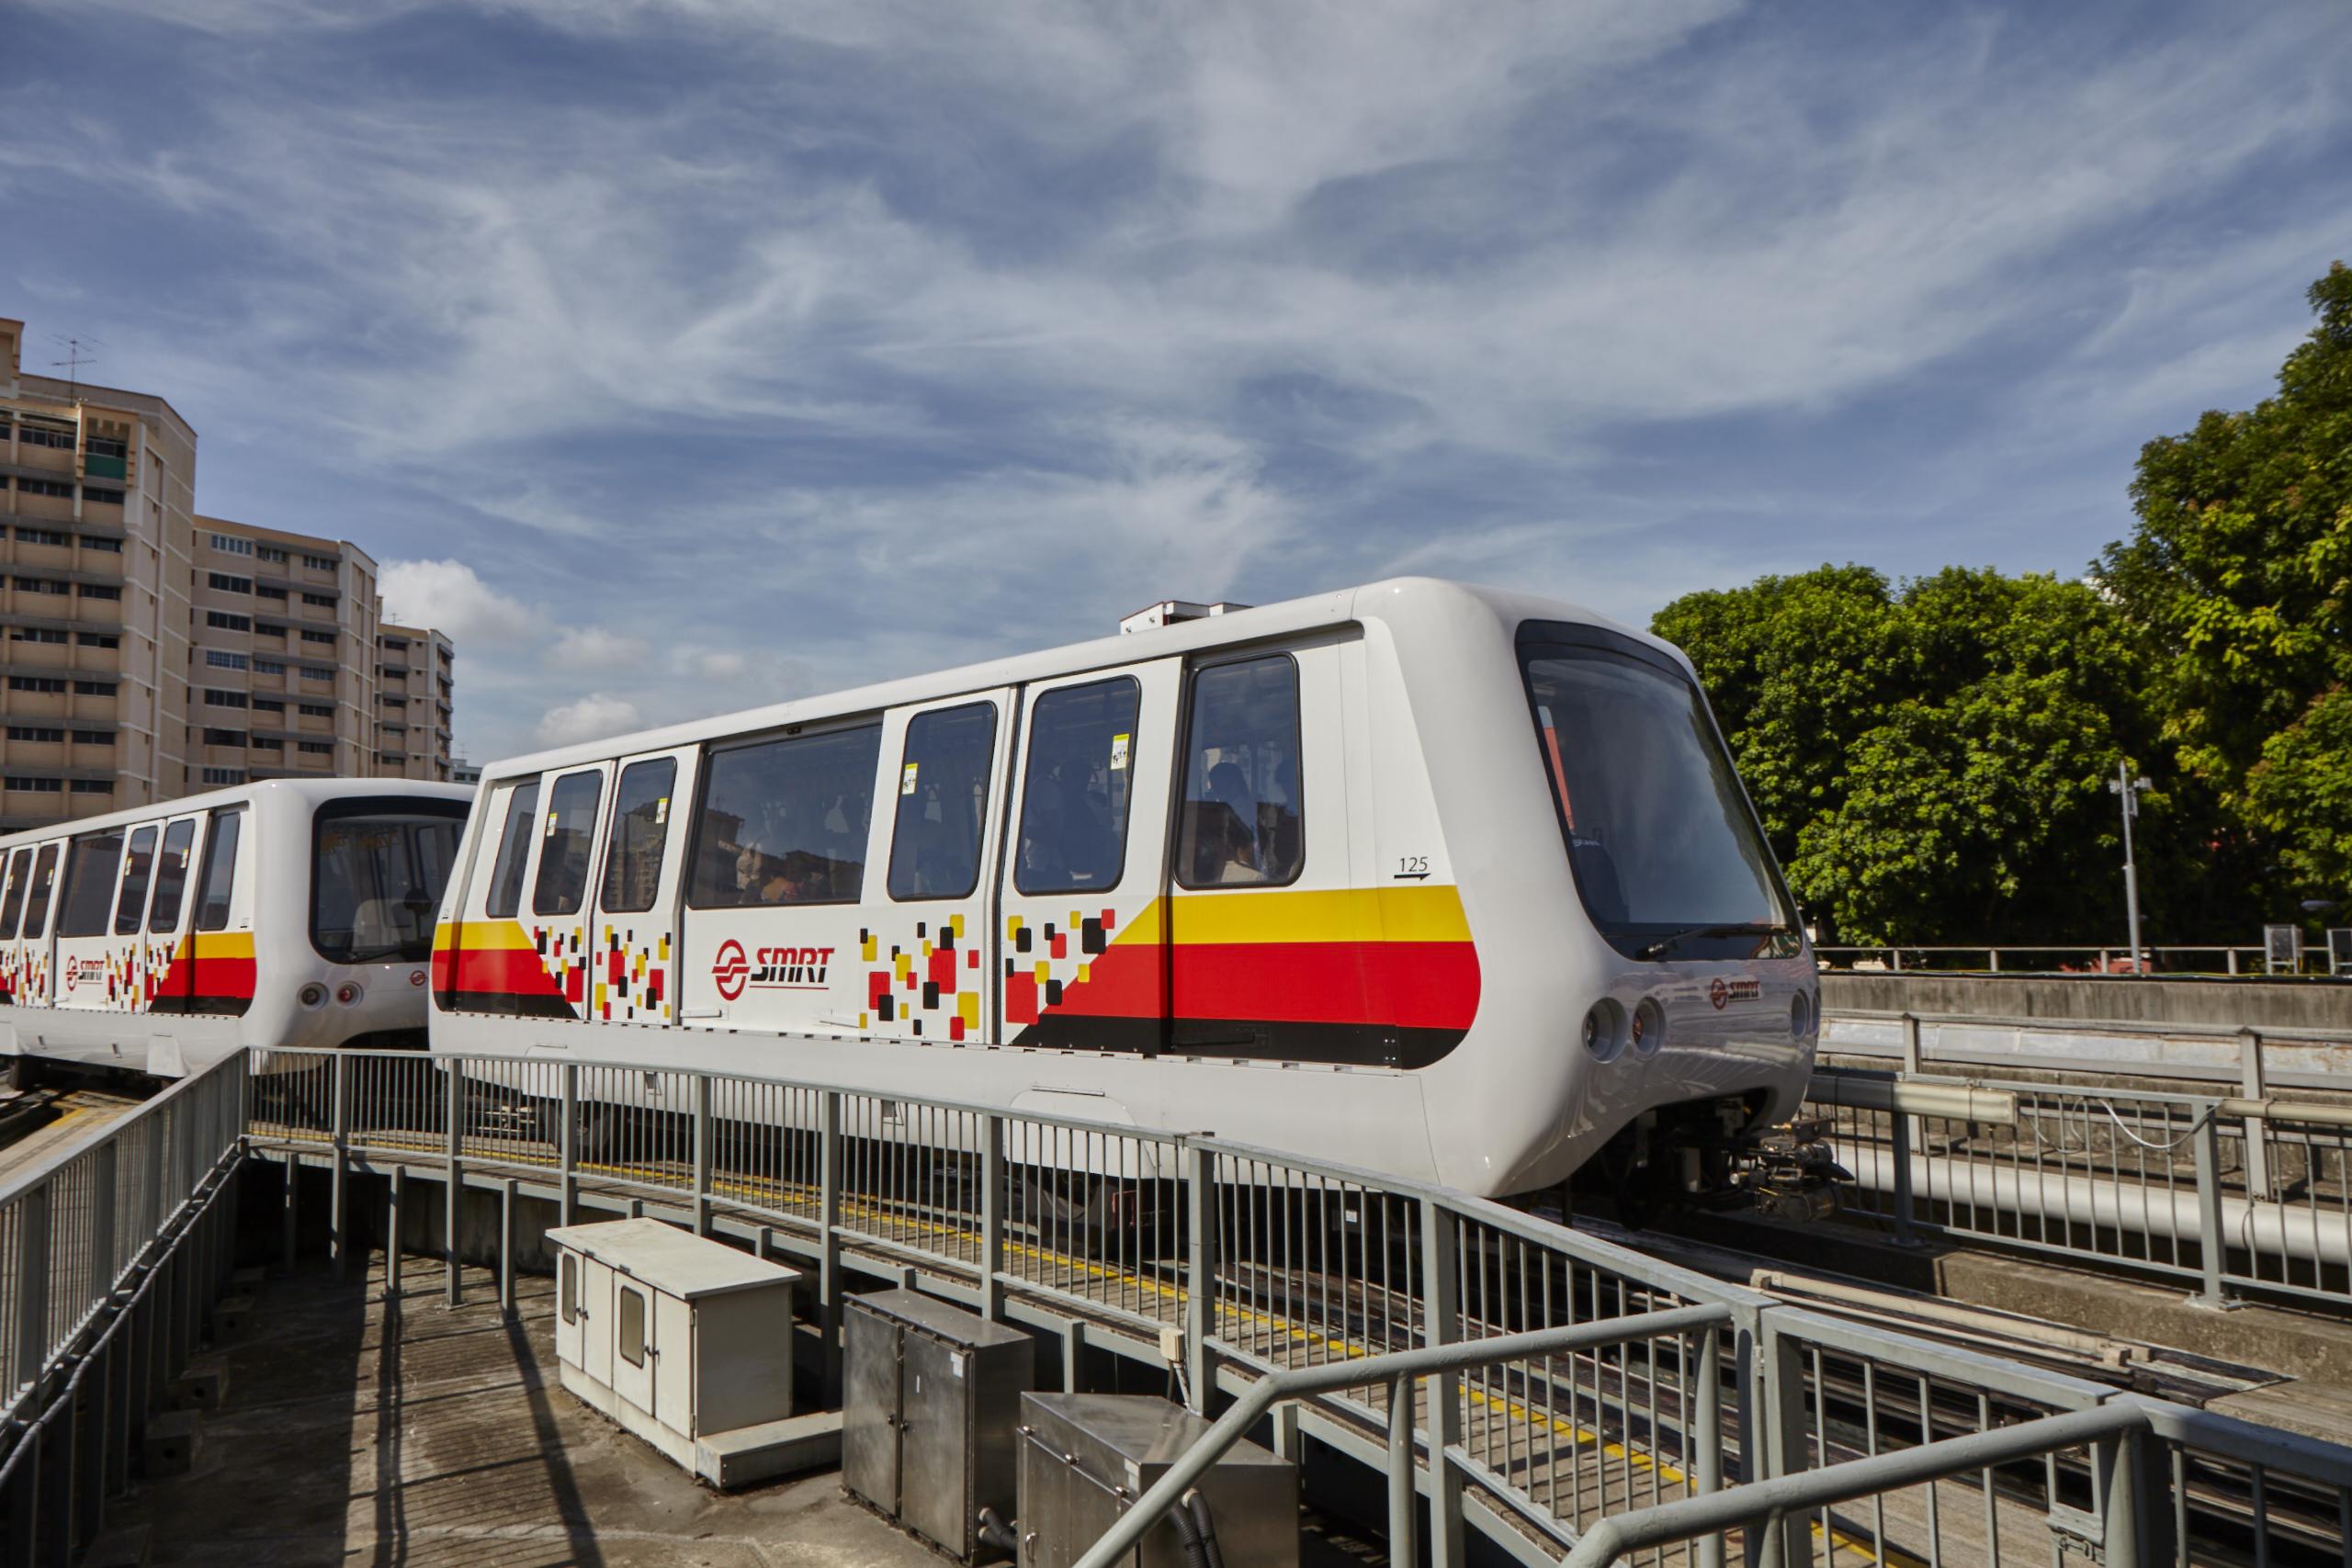 Bukit Panjang LRT to resume service on